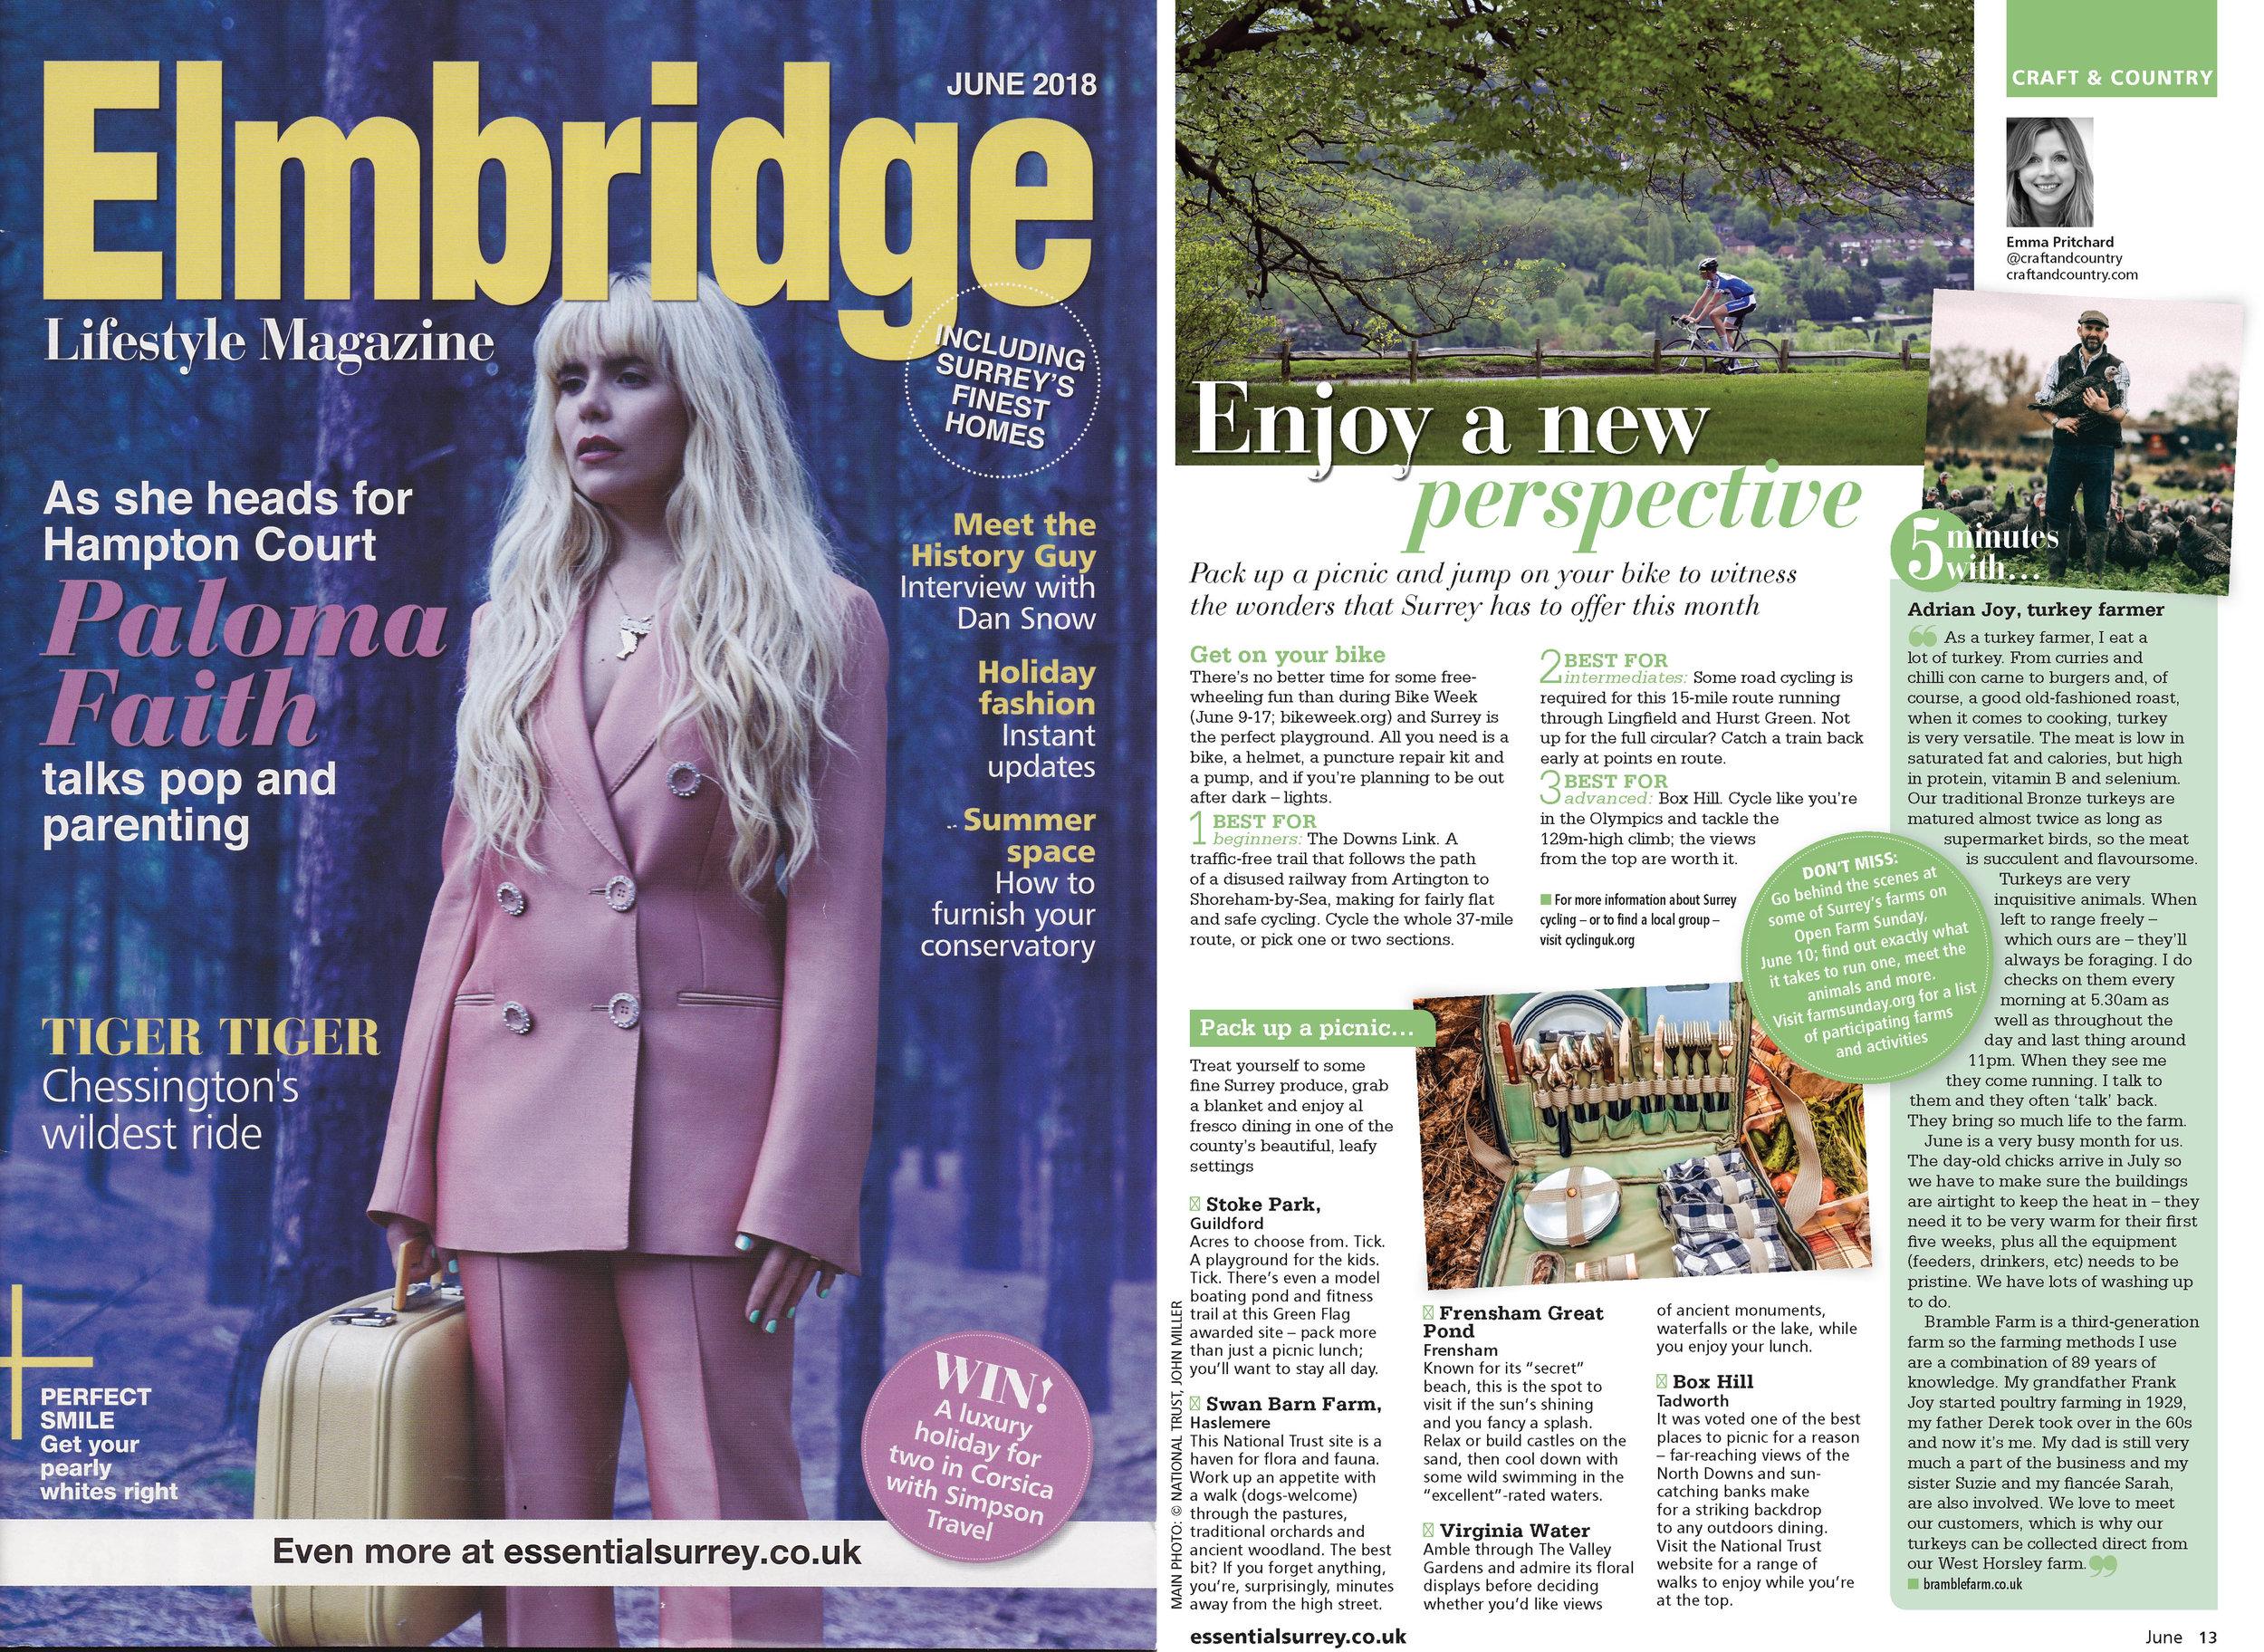 Elmbridge lifestyle magazine June 2018 Essential surrey Bramble Farm Turkey interview.jpg